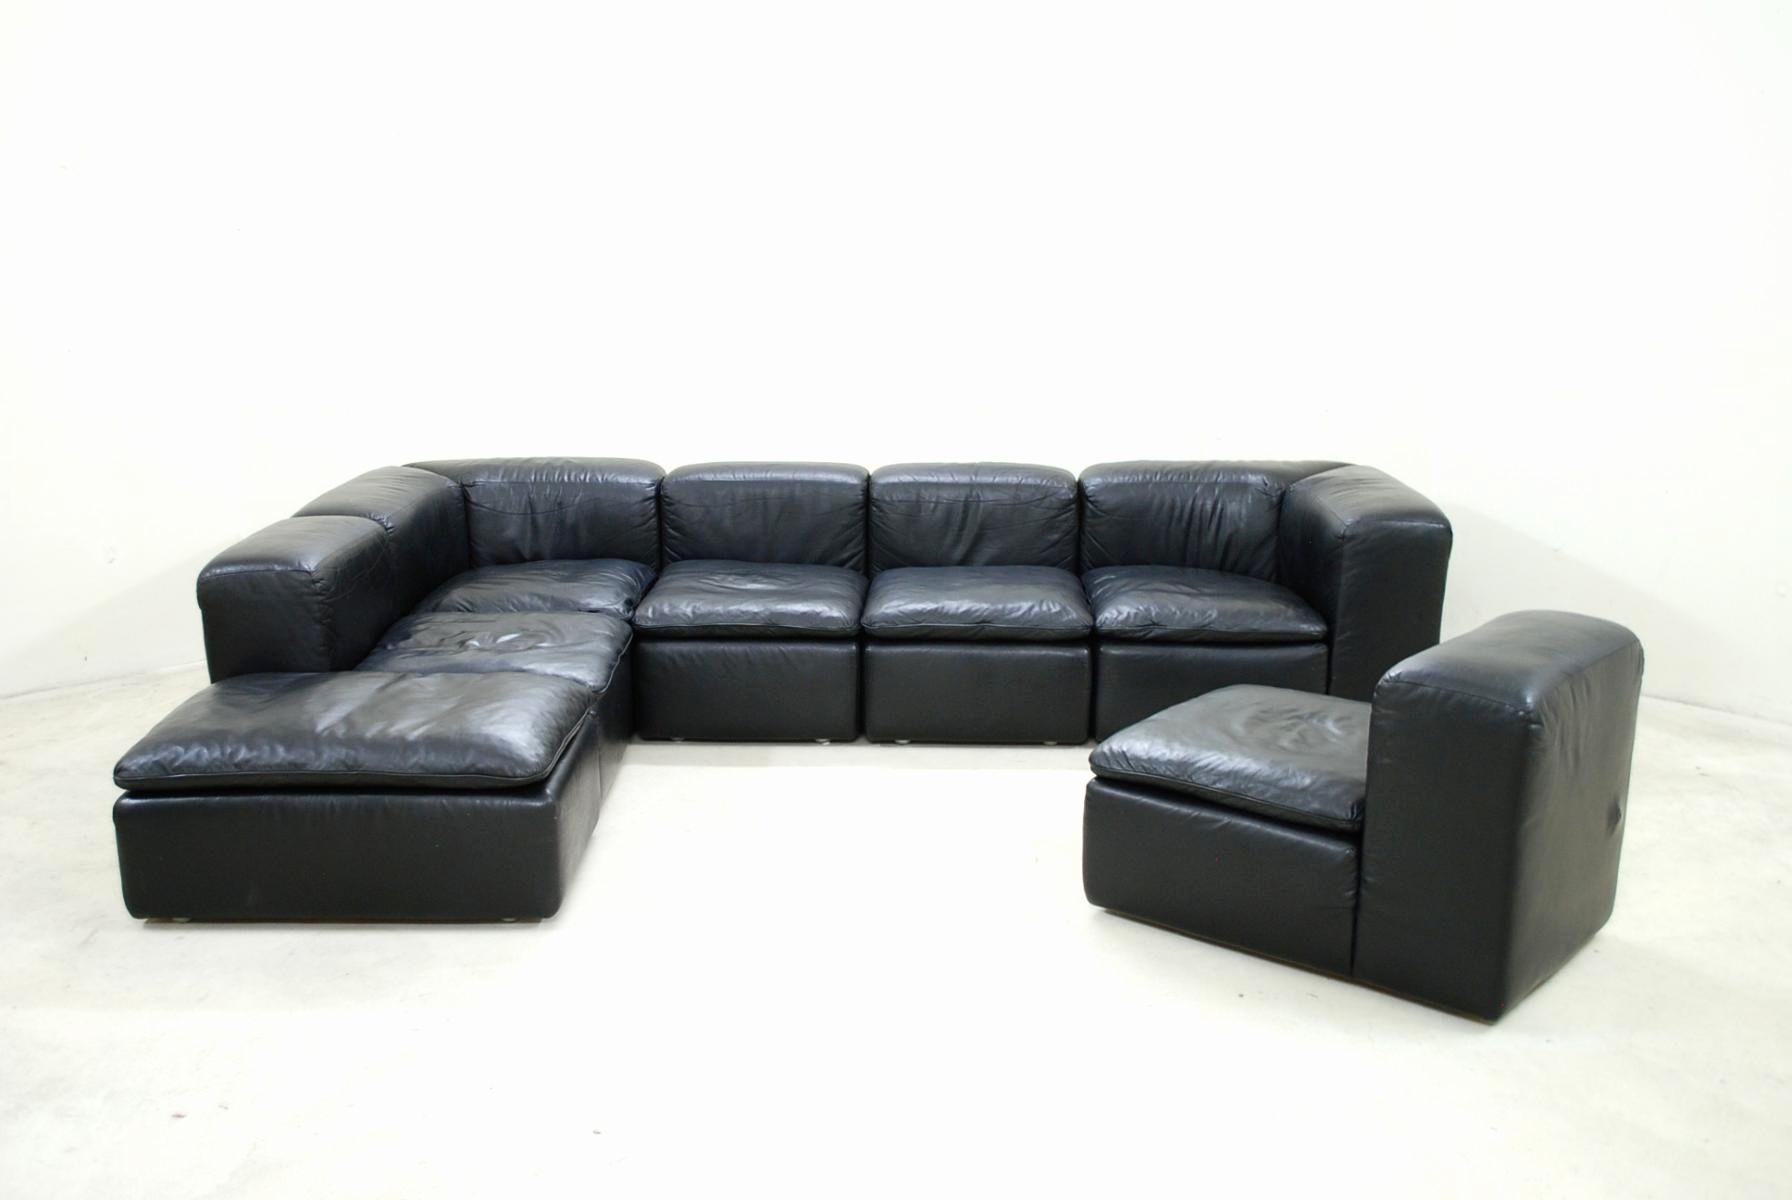 Unique Leather Modular sofa Pictures vintage leather